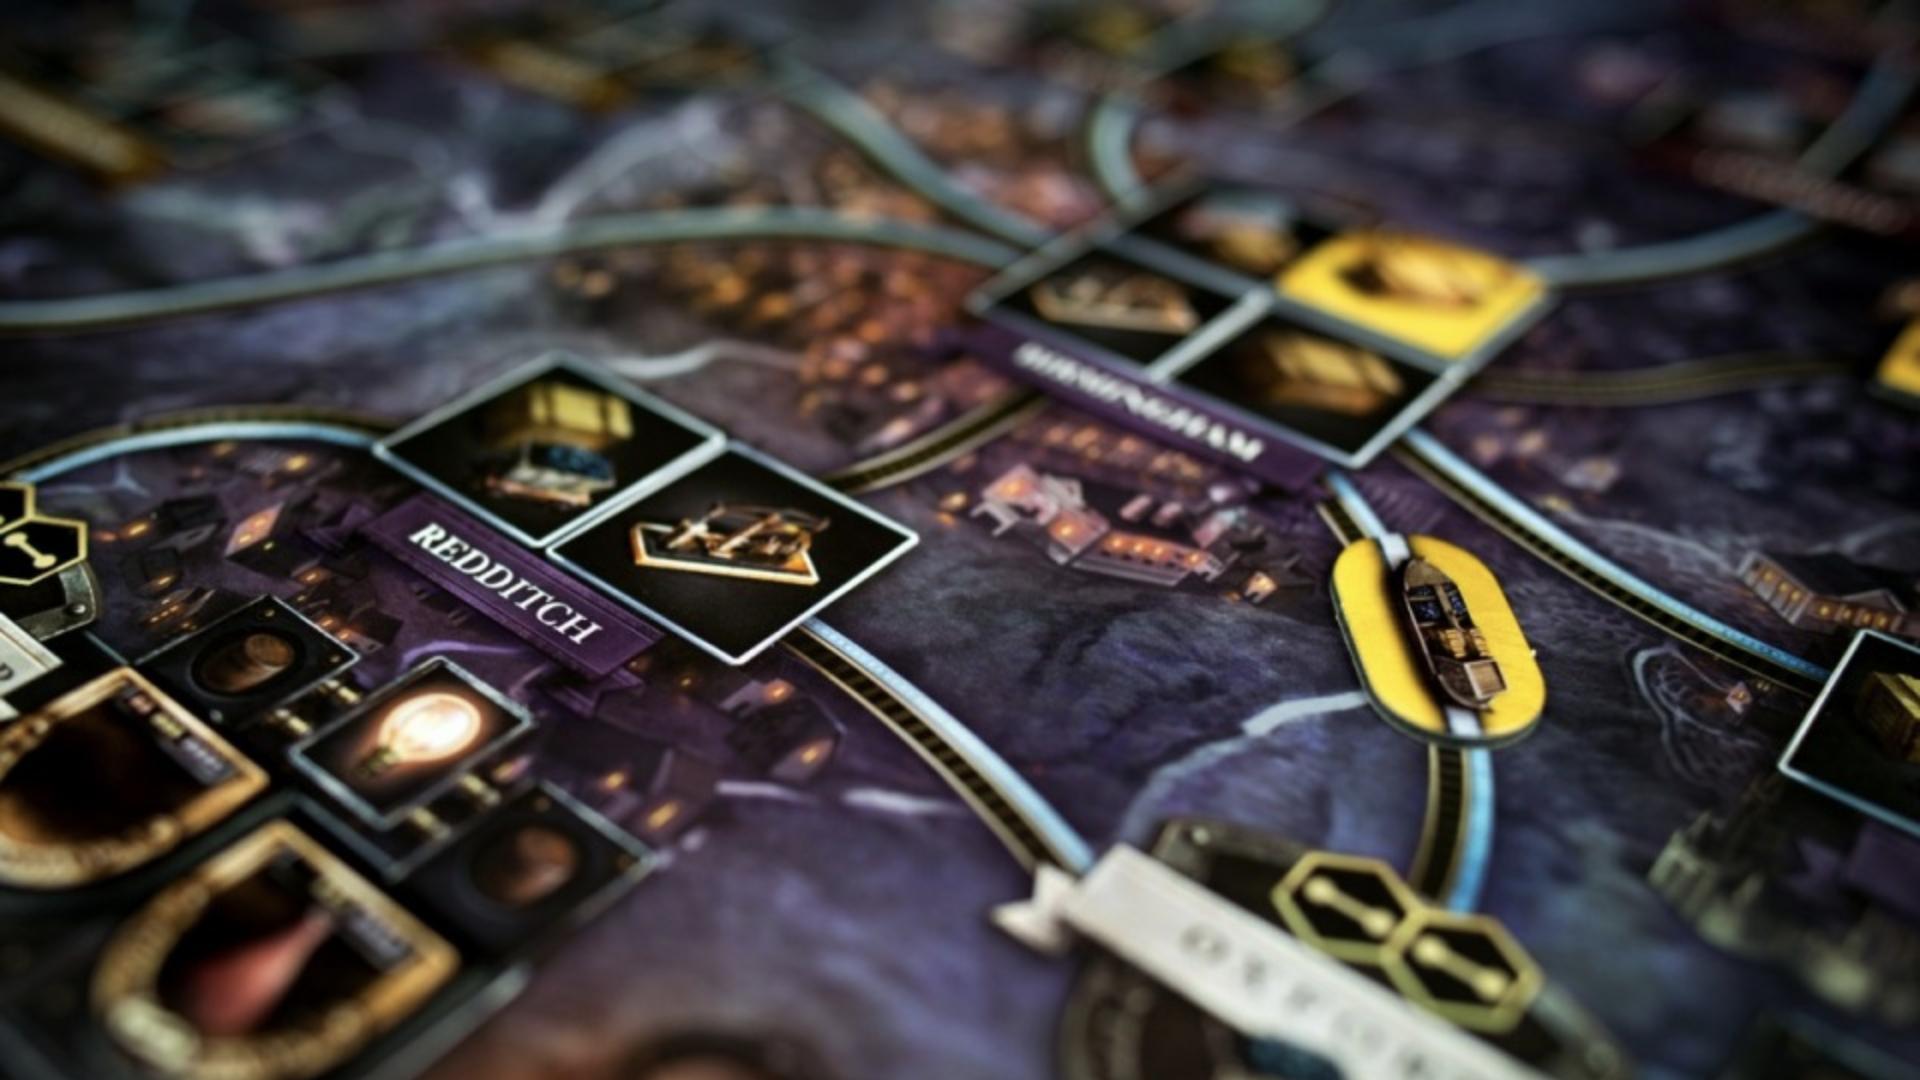 Brass: Birmingham board game layout 3